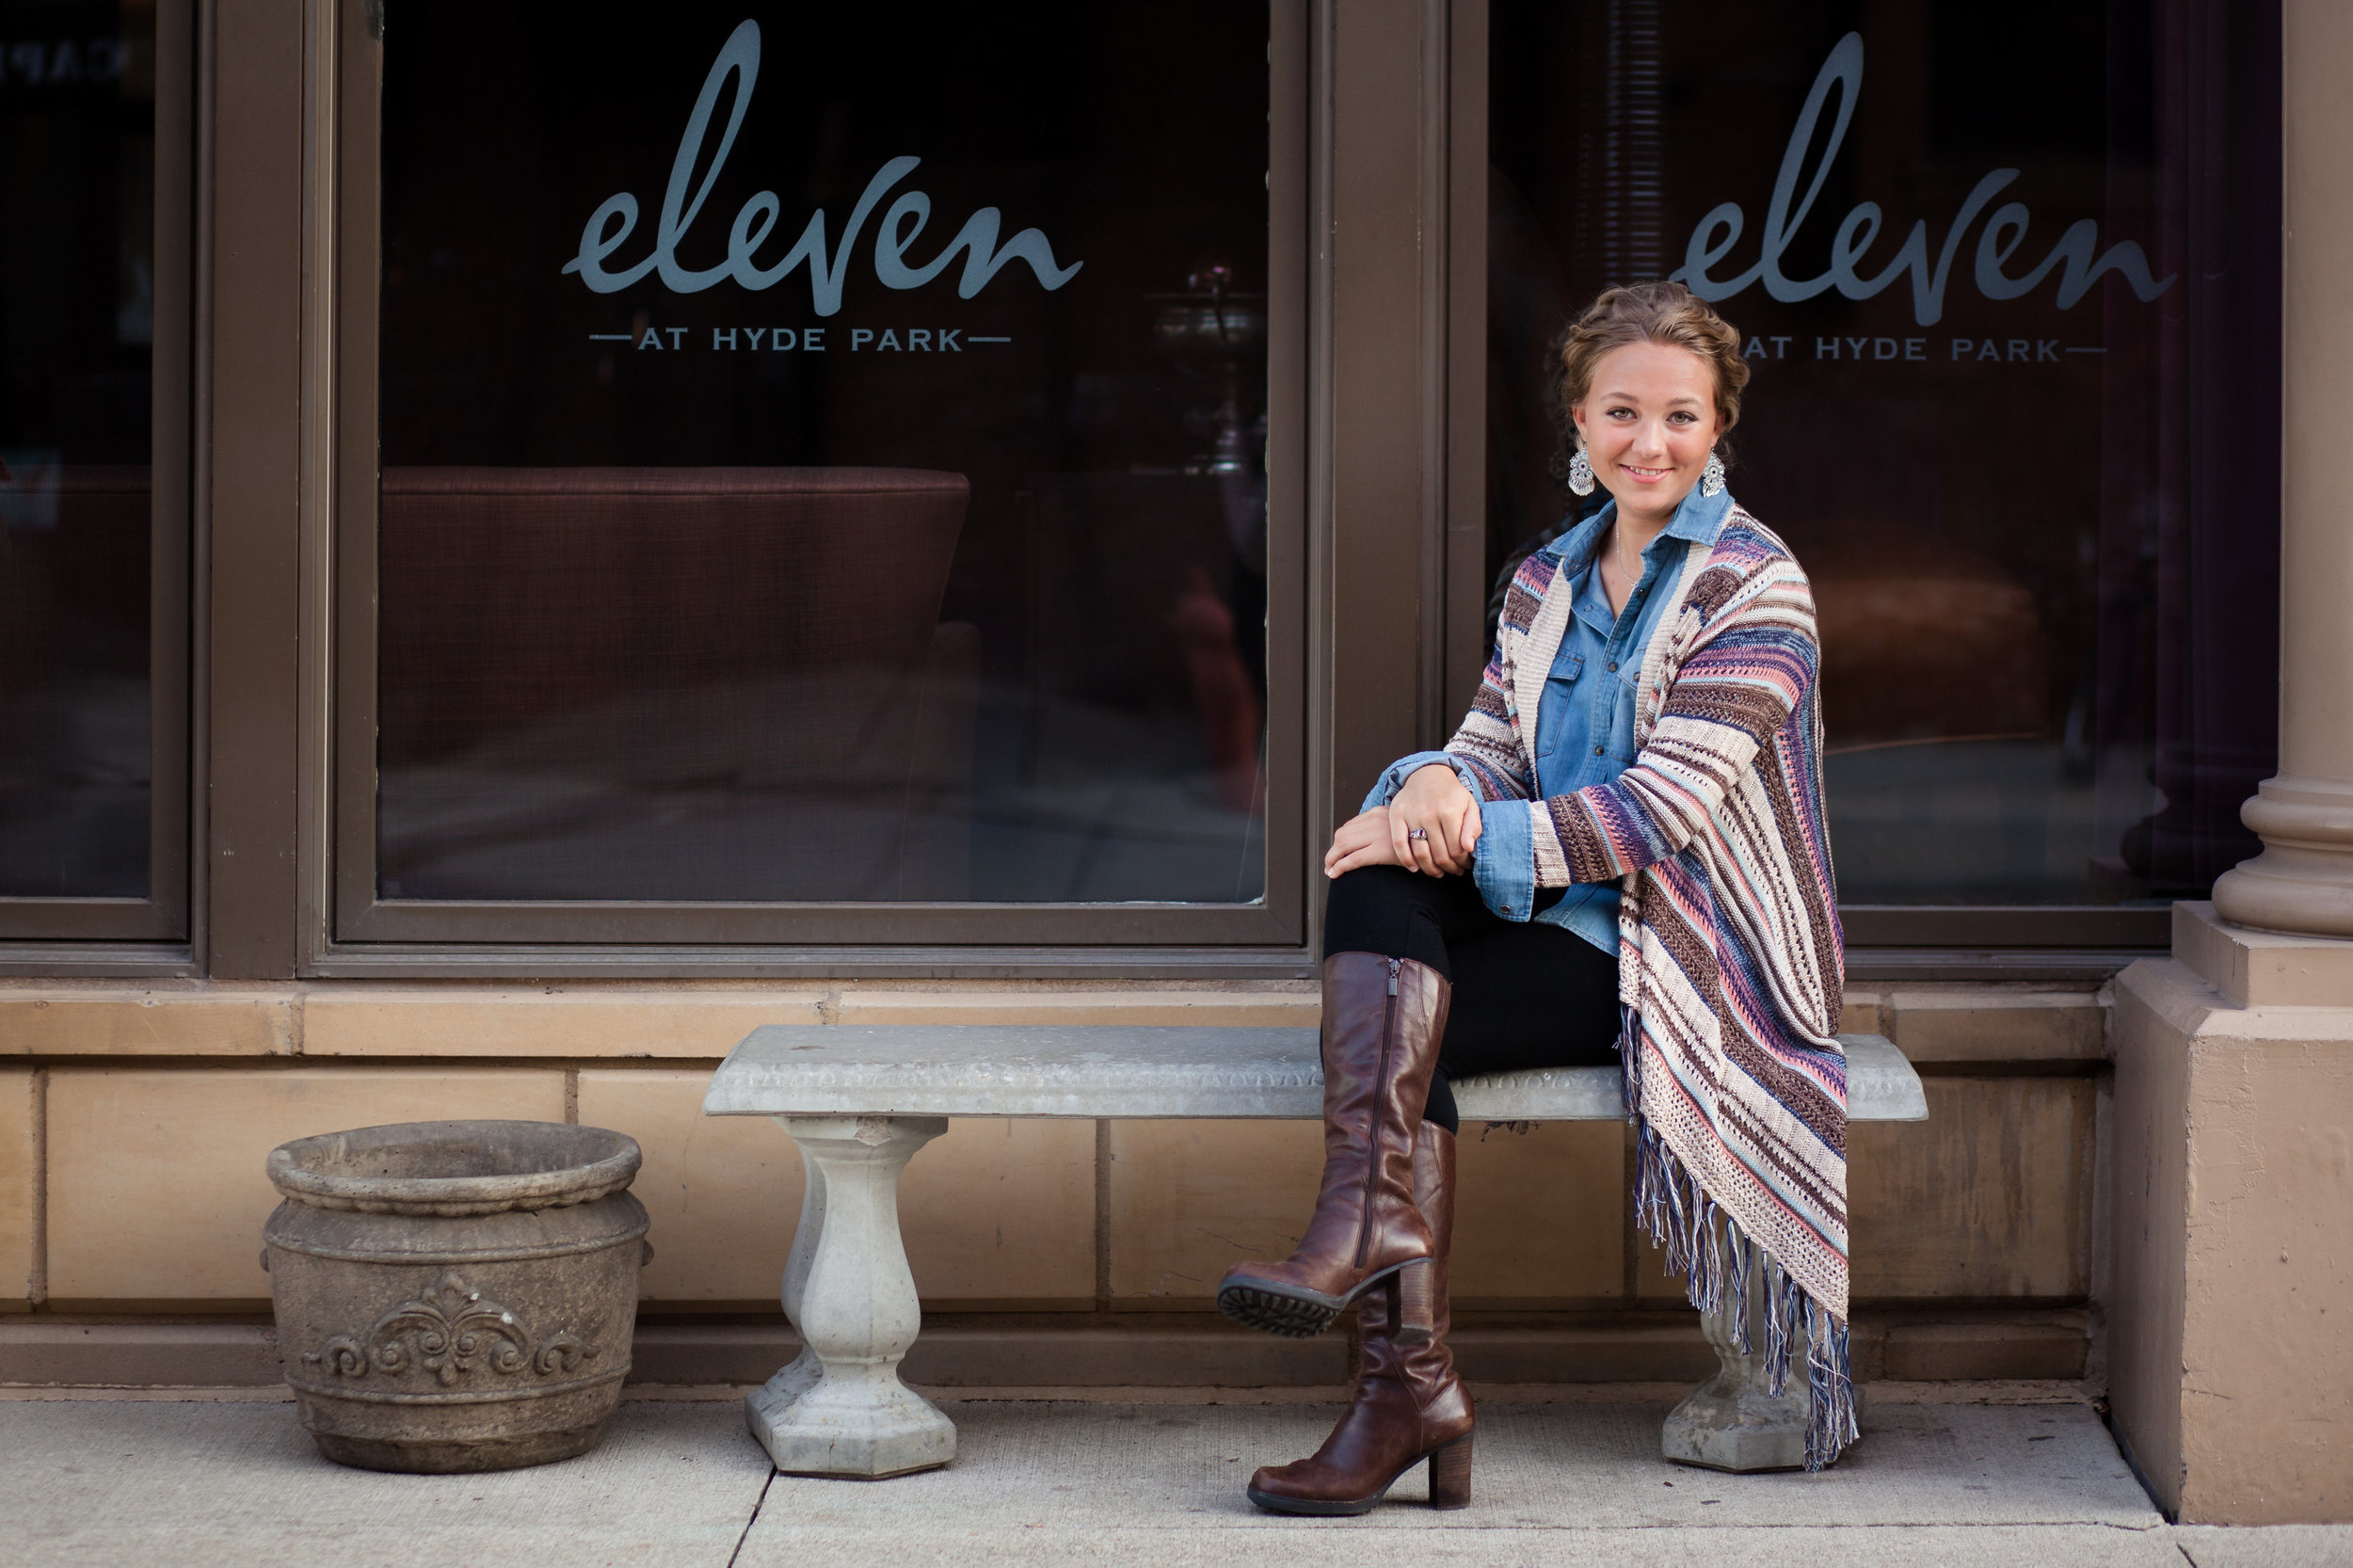 Elise Seeley 2014-Elise Seeley 2014-0058.jpg